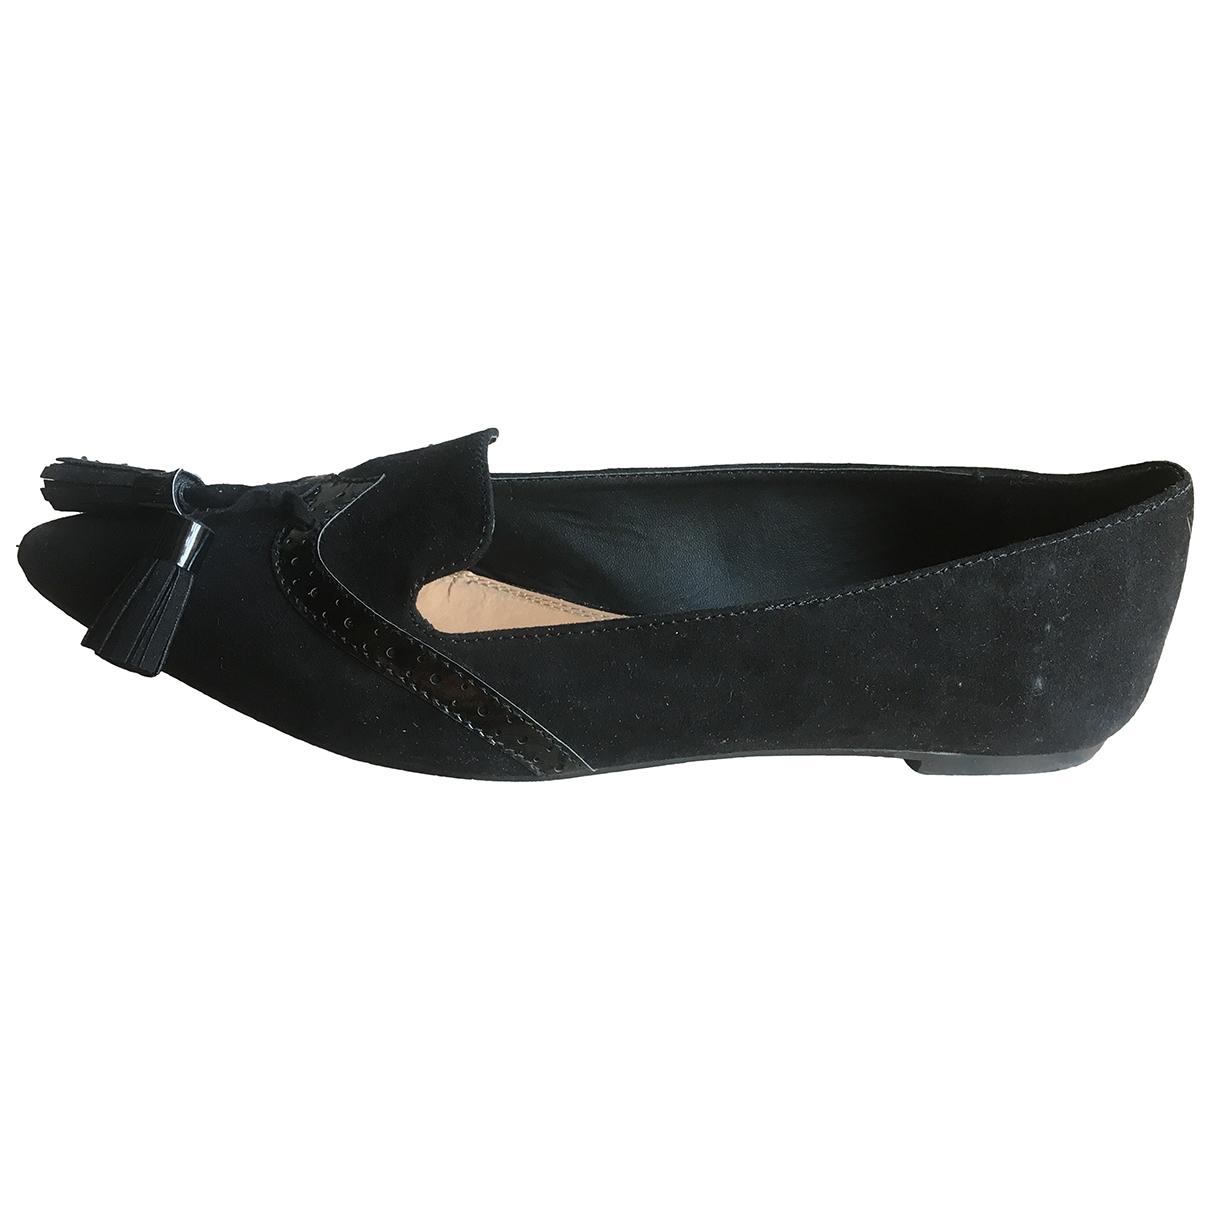 Asos \N Ballerinas in  Schwarz Polyester